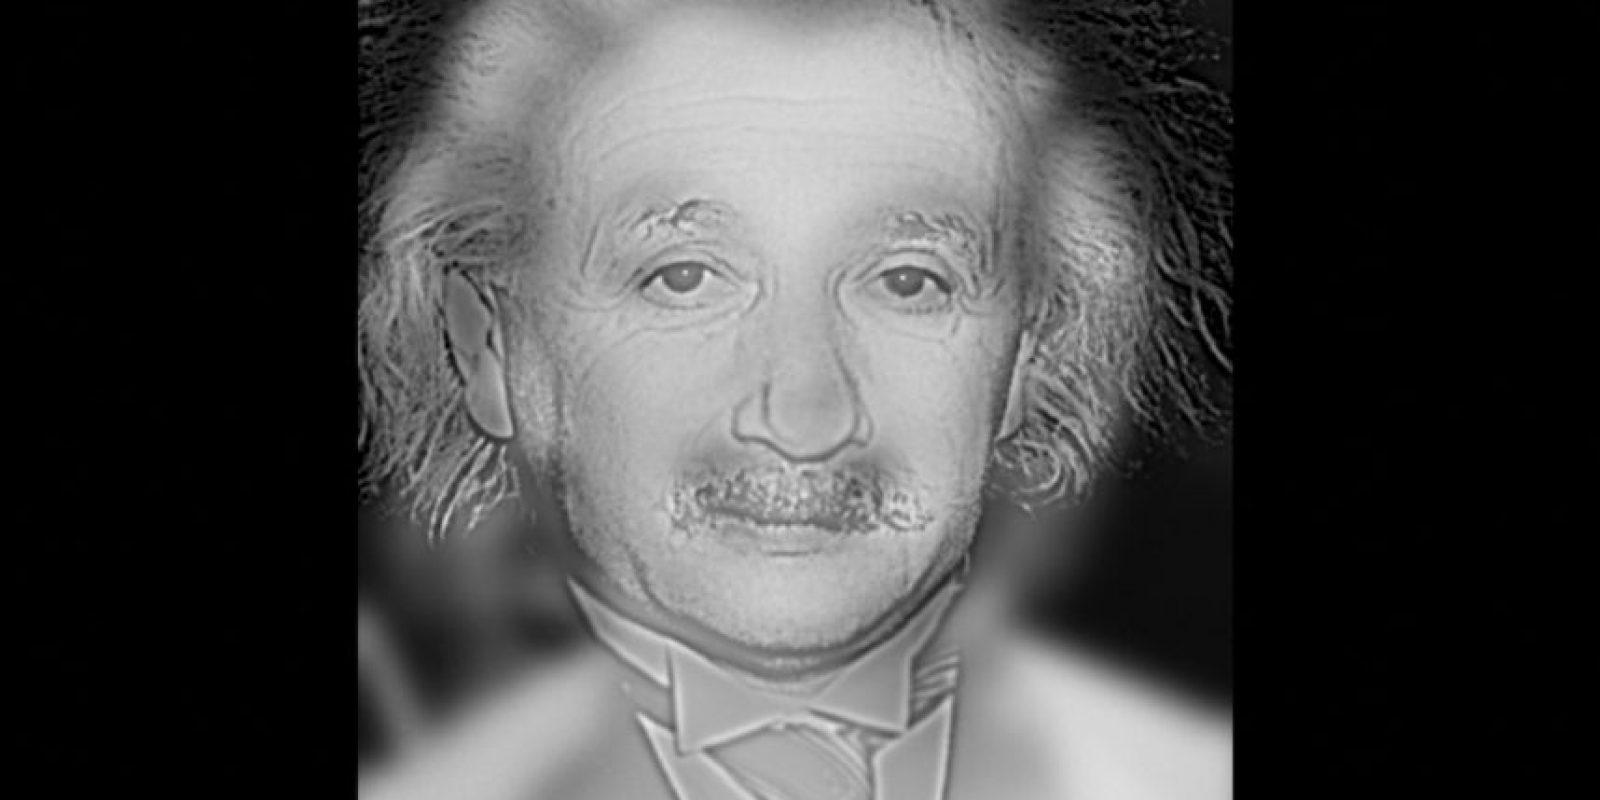 Sin embargo, algunas son creadas. ¿A quién ven aquí? ¿Marilyn Monroe o Albert Einstein? Foto:mit.edu – Aude Oliva